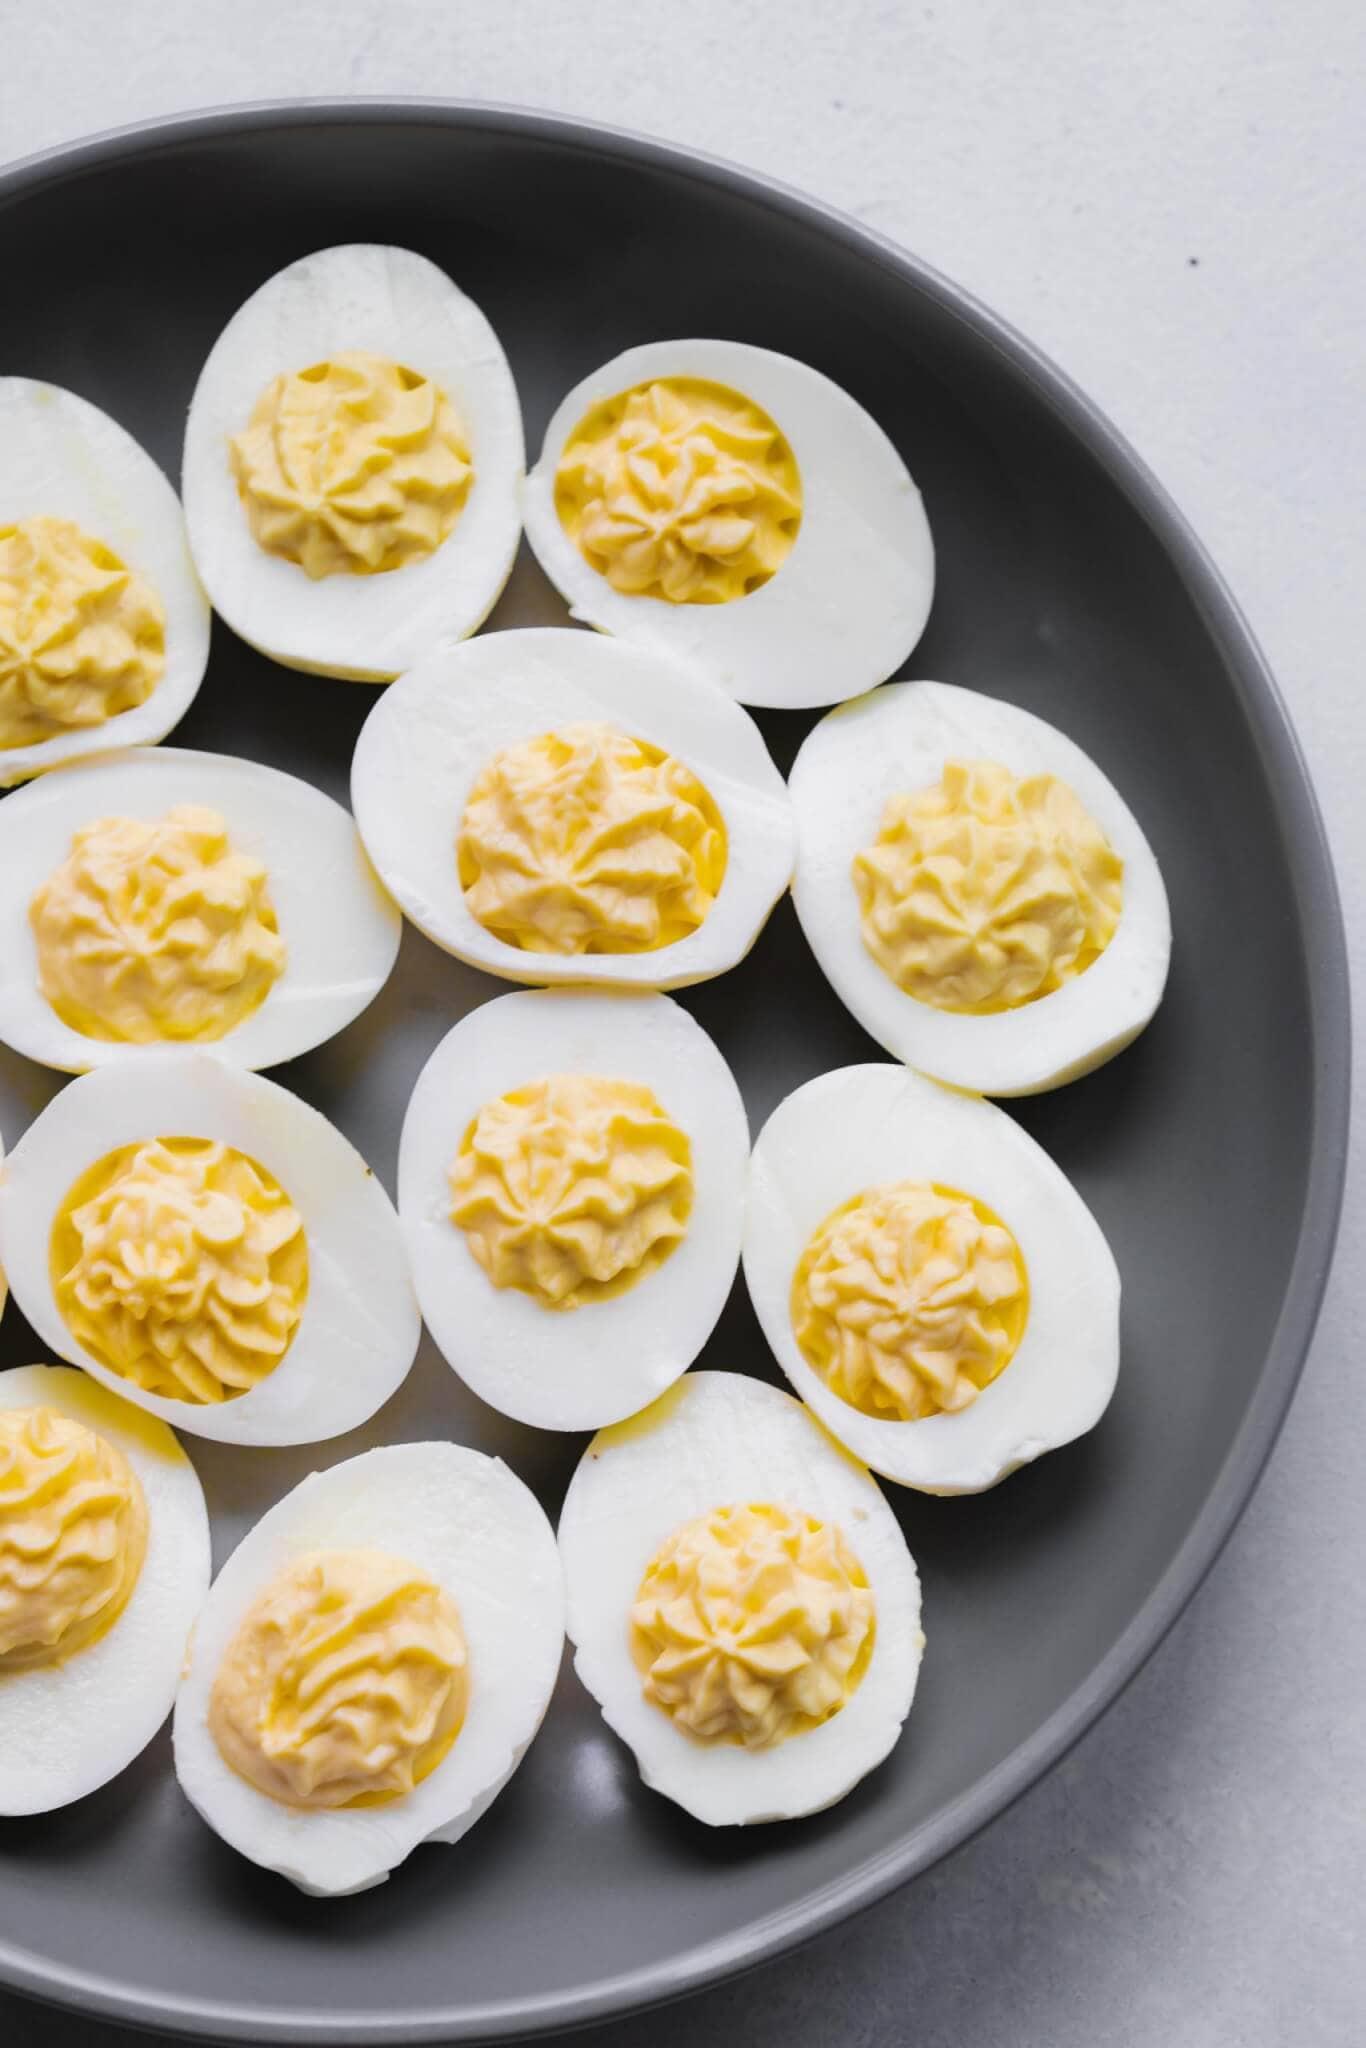 Deviled eggs on grey plate before garnishing.